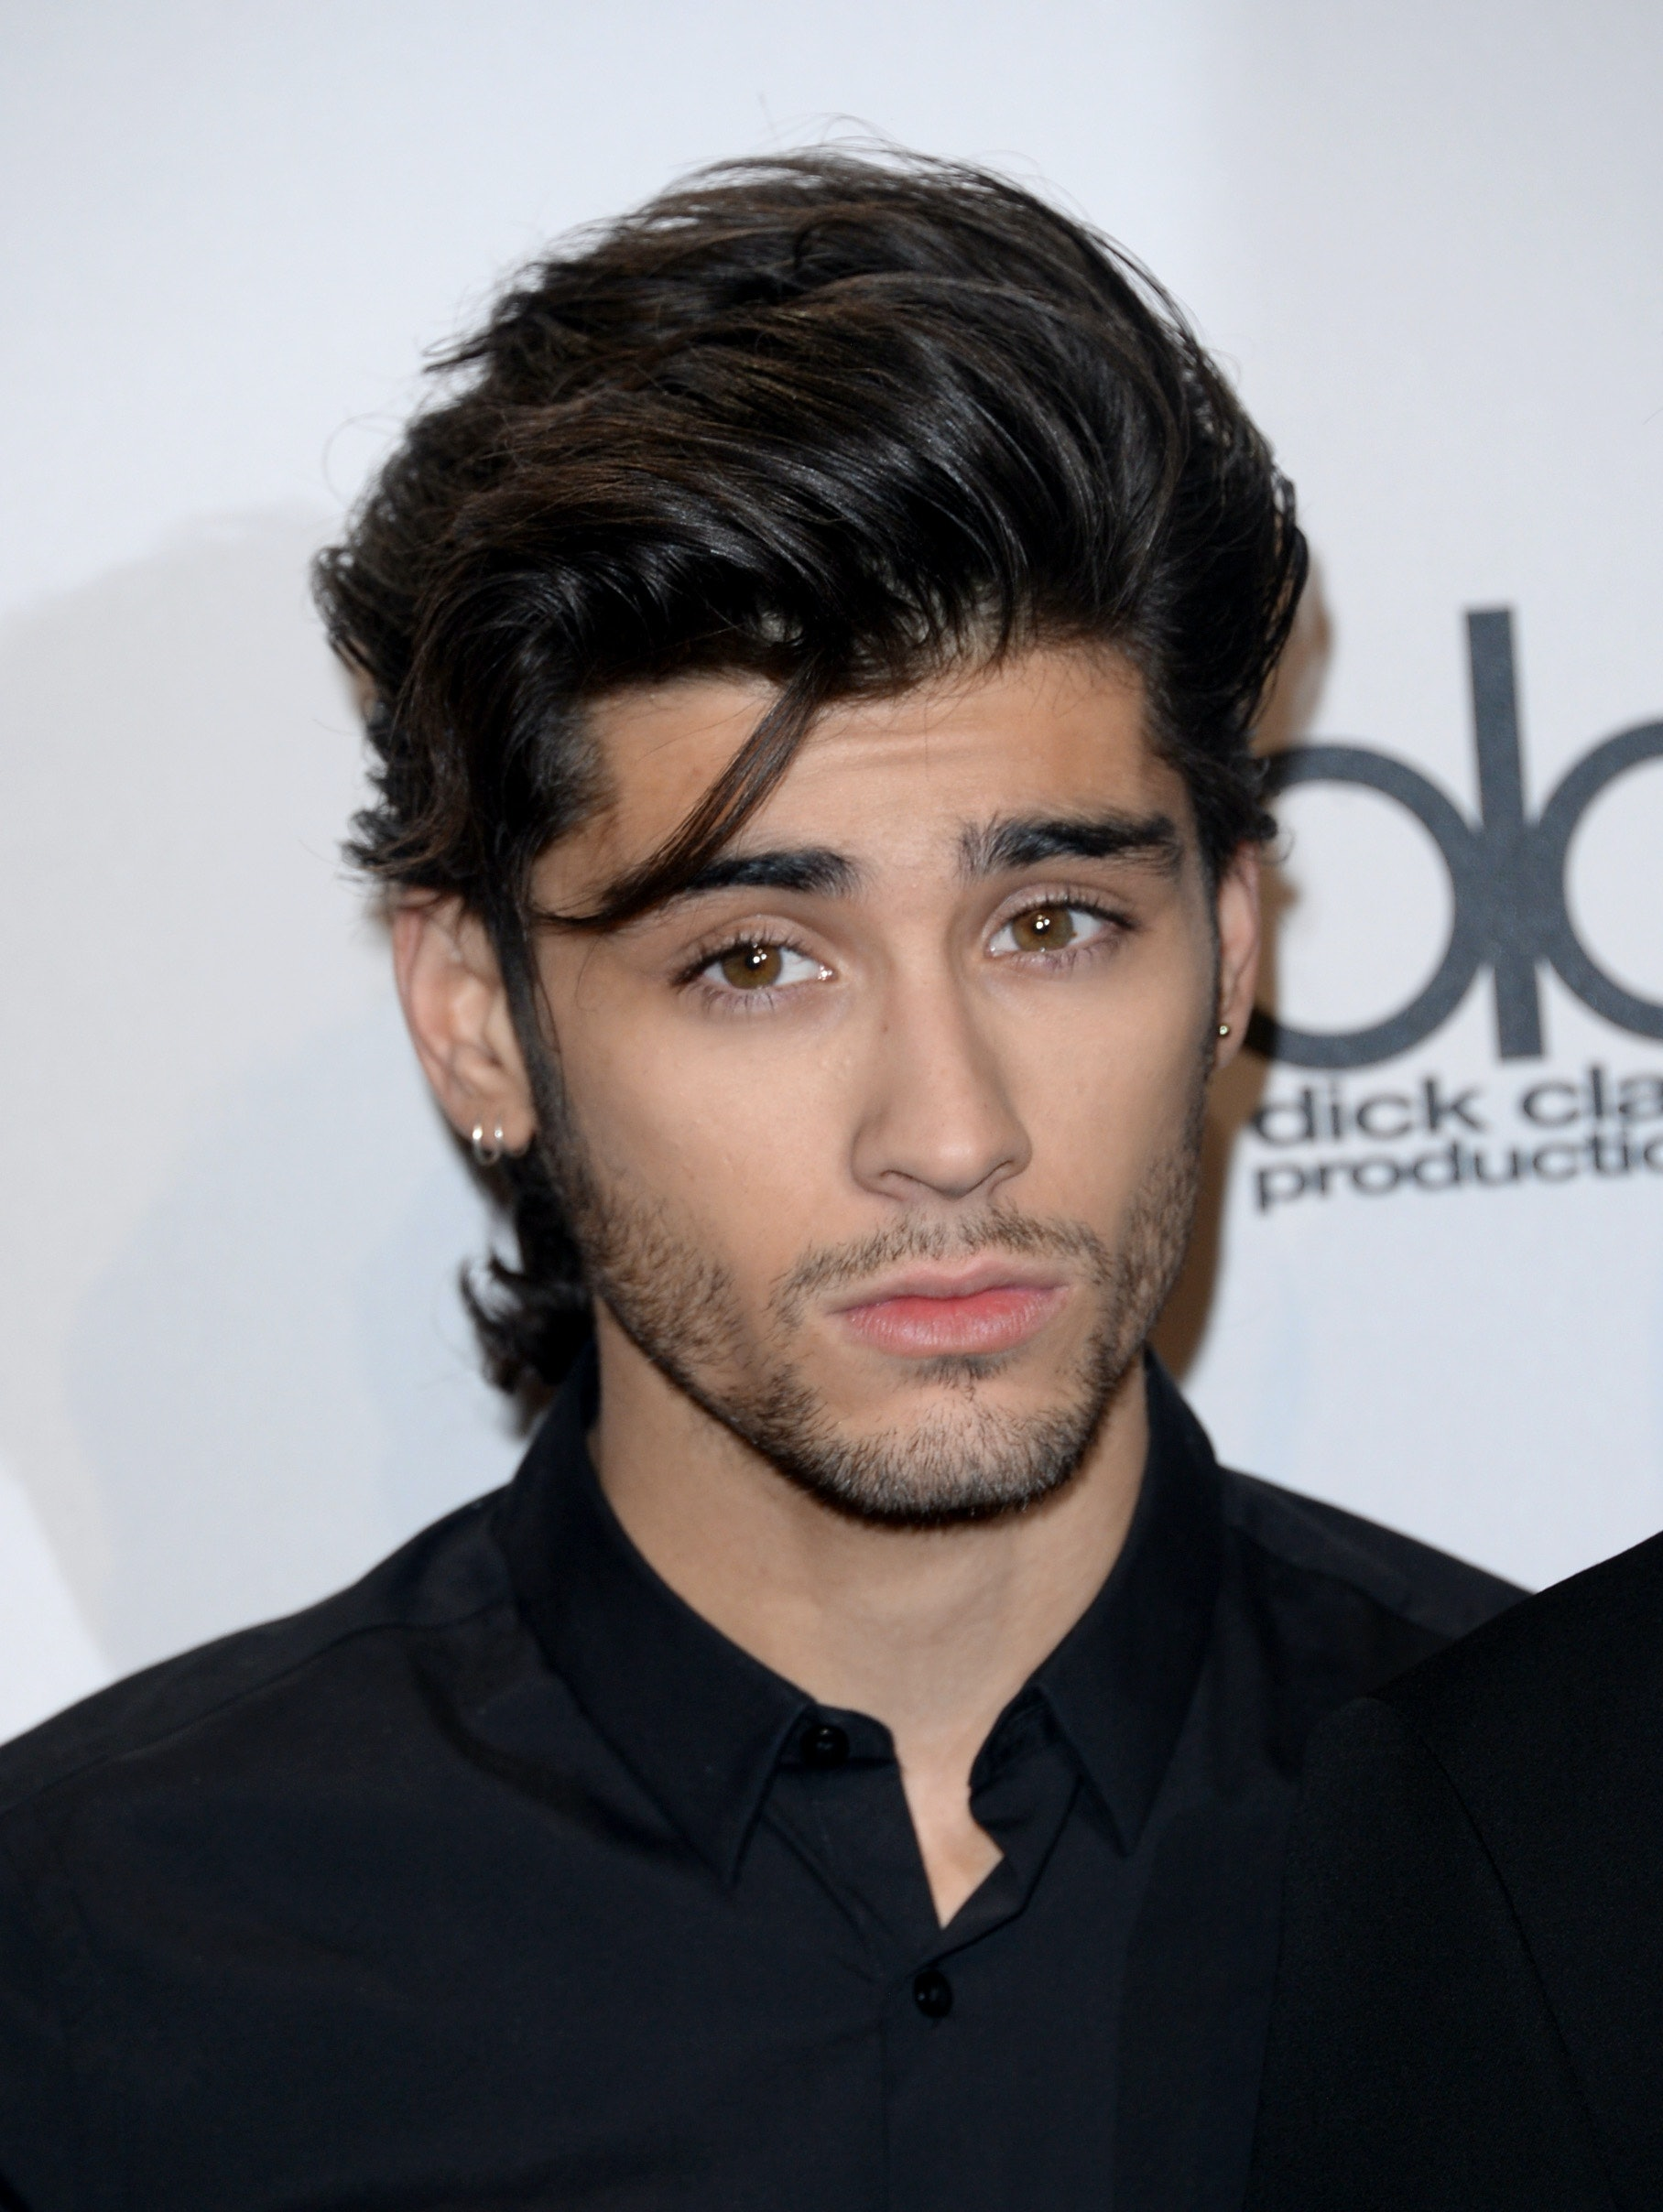 Zayn Malik S Facial Hair Evolution Will Make You All Sorts Of Nostalgic Photos